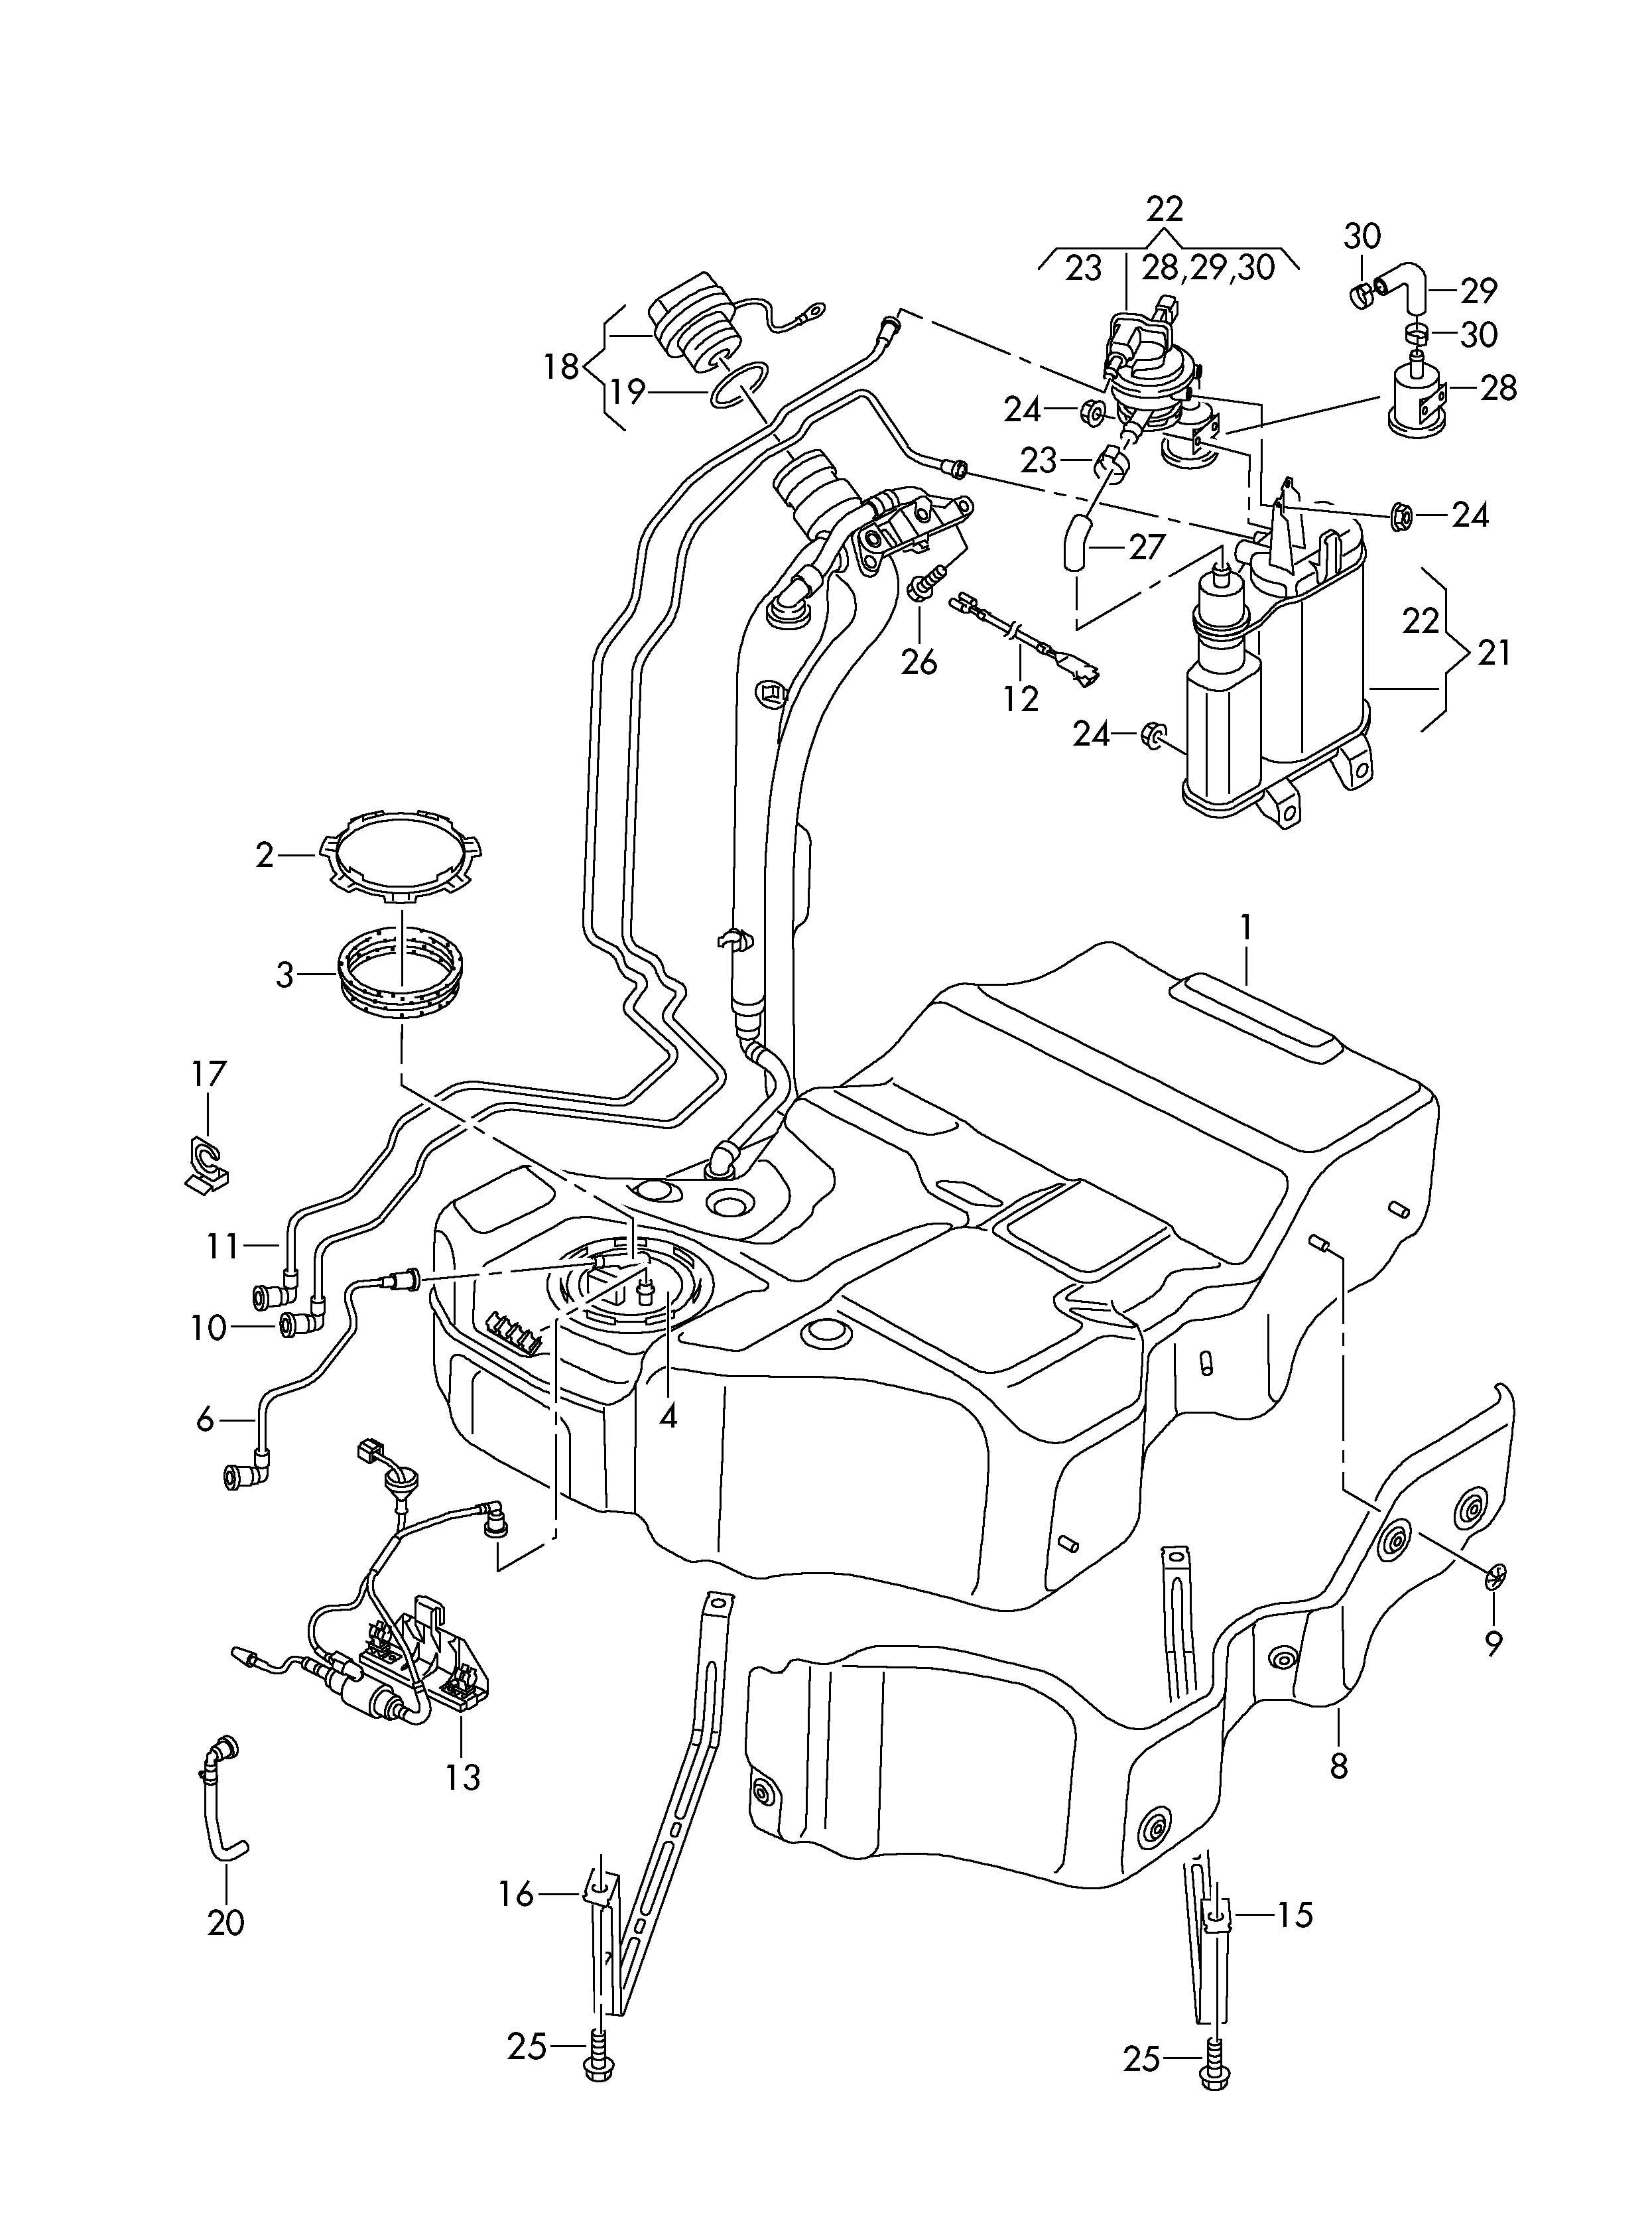 Volkswagen Passat With Leak Detection Pump Diagnosis